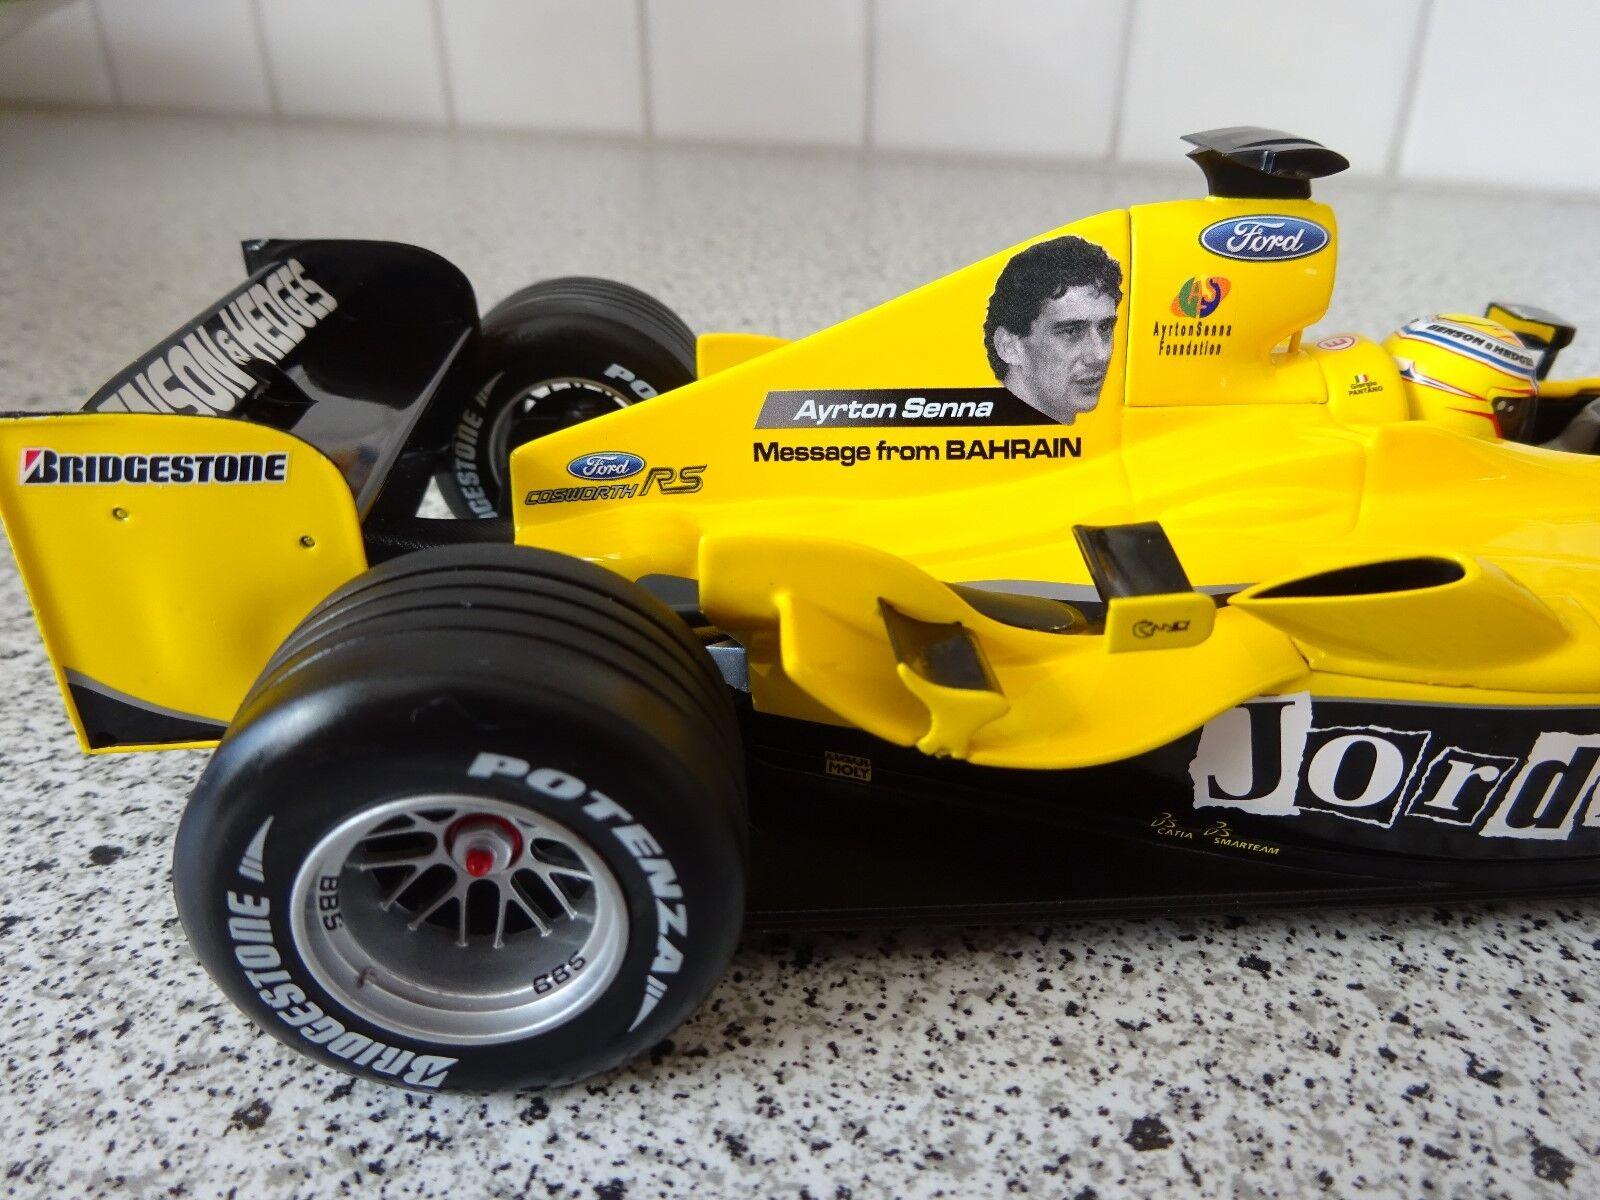 Jordan EJ14 Giorigo Pantano   Imola GP 2004 - Ayrton Senna Livery   1 18